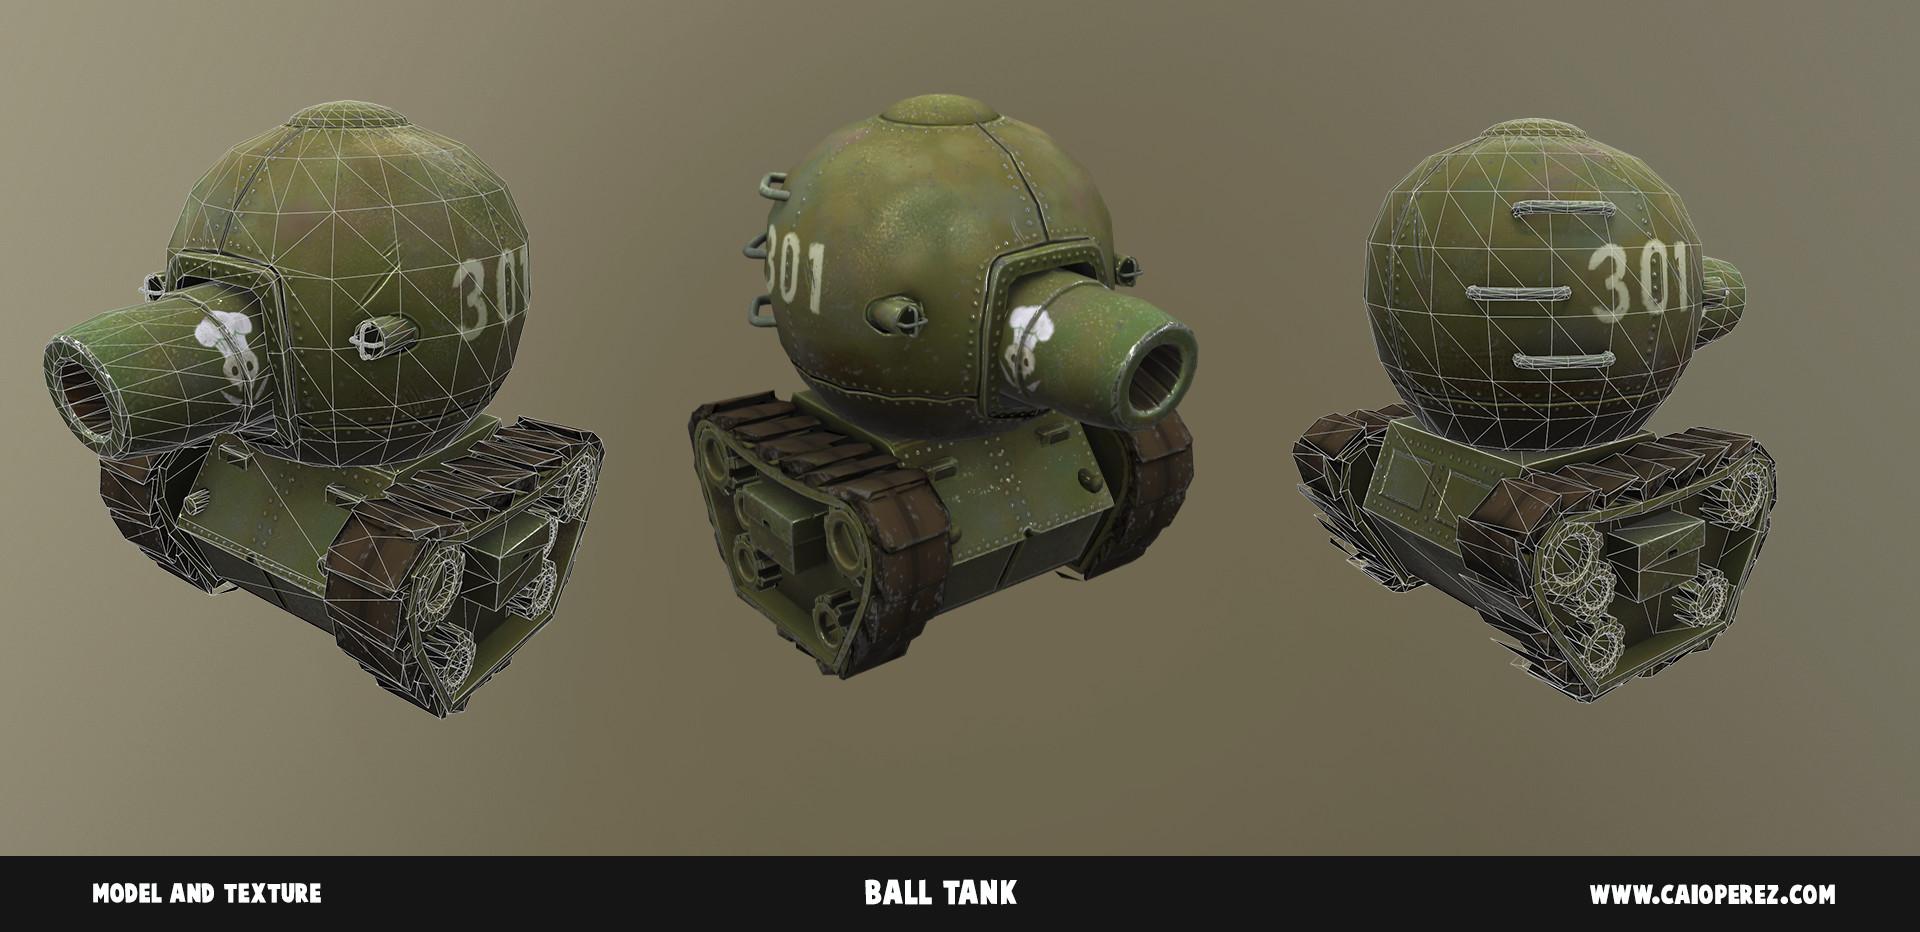 Caio perez ball tank render